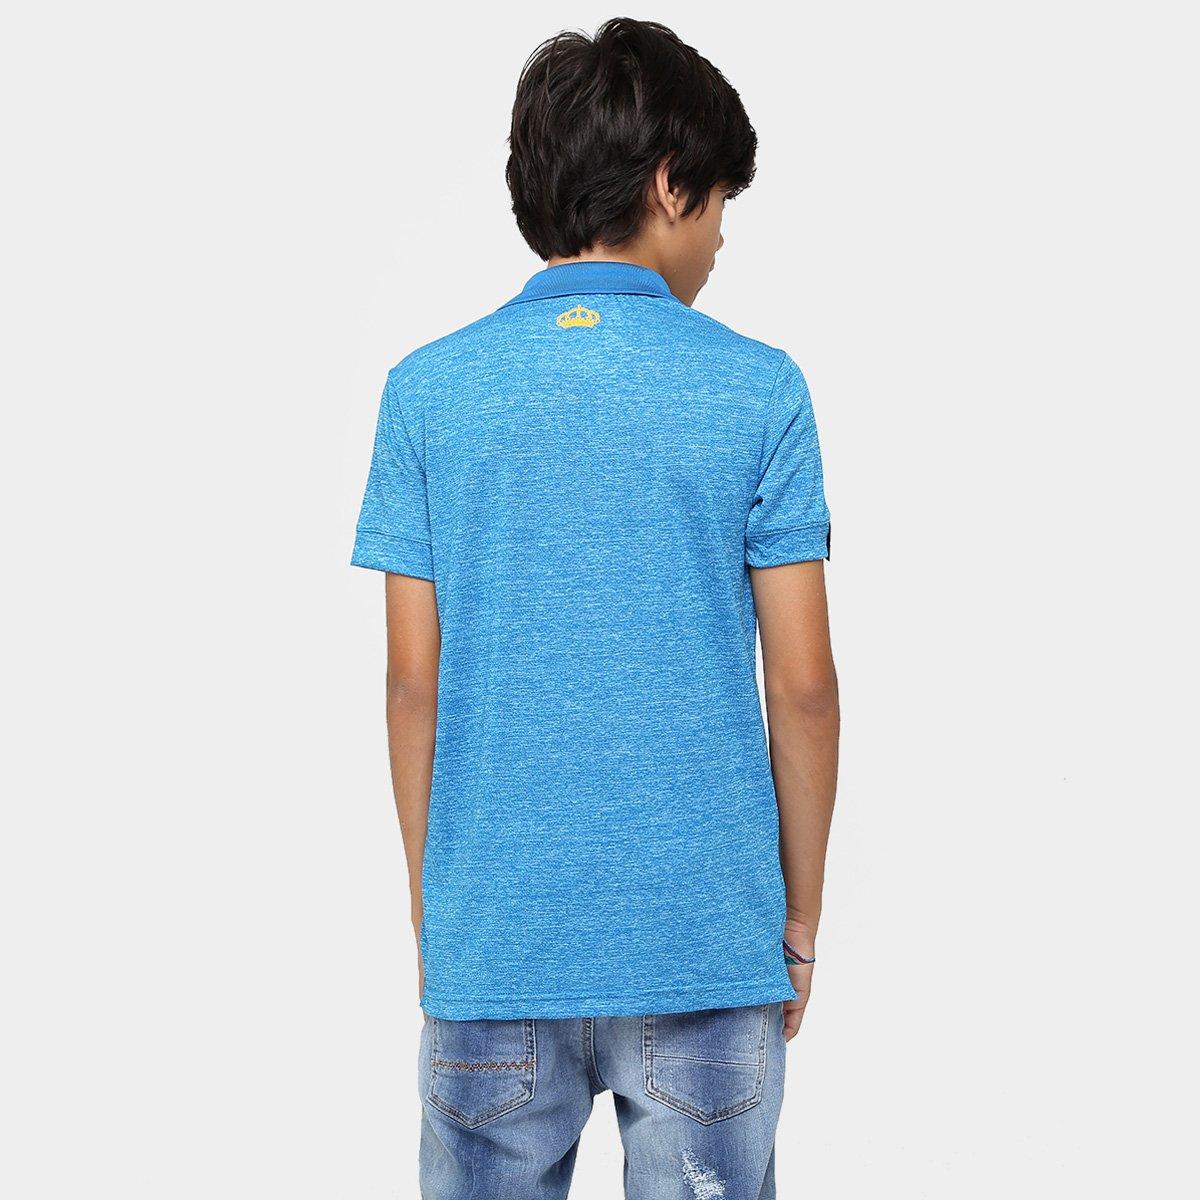 Camisa Cruzeiro Juvenil III 15 16 s nº Penalty Masculina - Compre ... e71fe61fedb5d